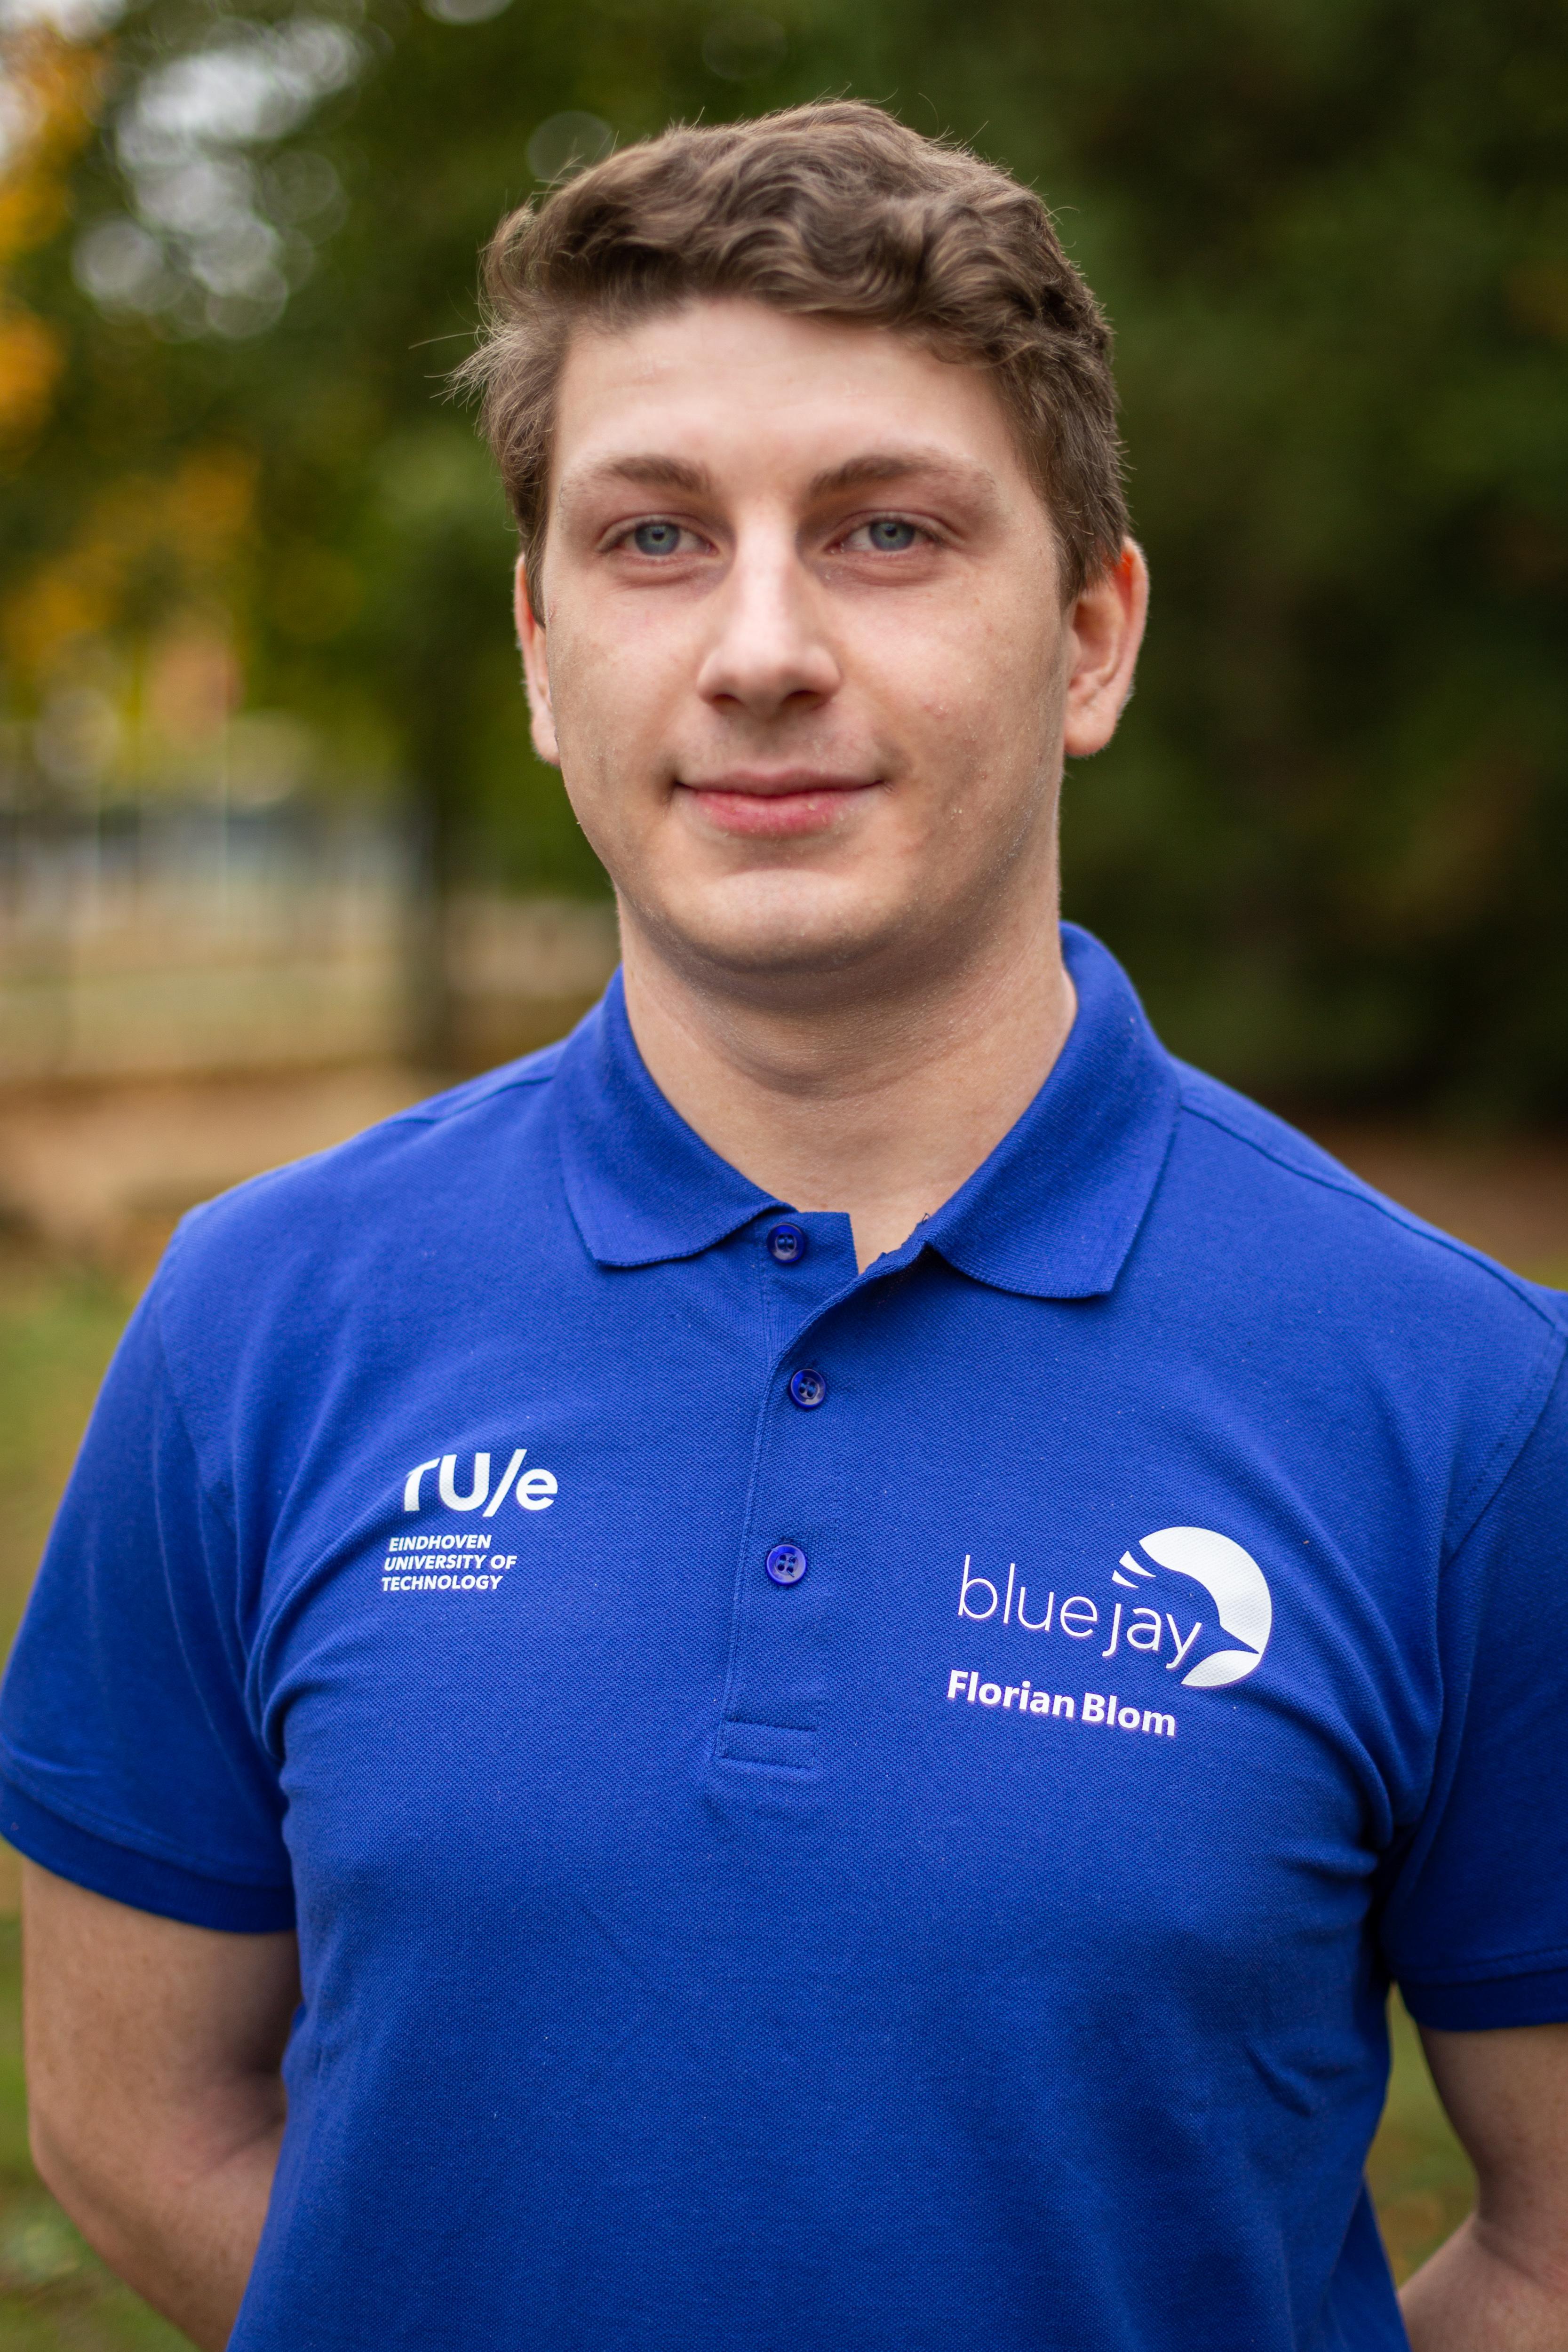 Florian Blom